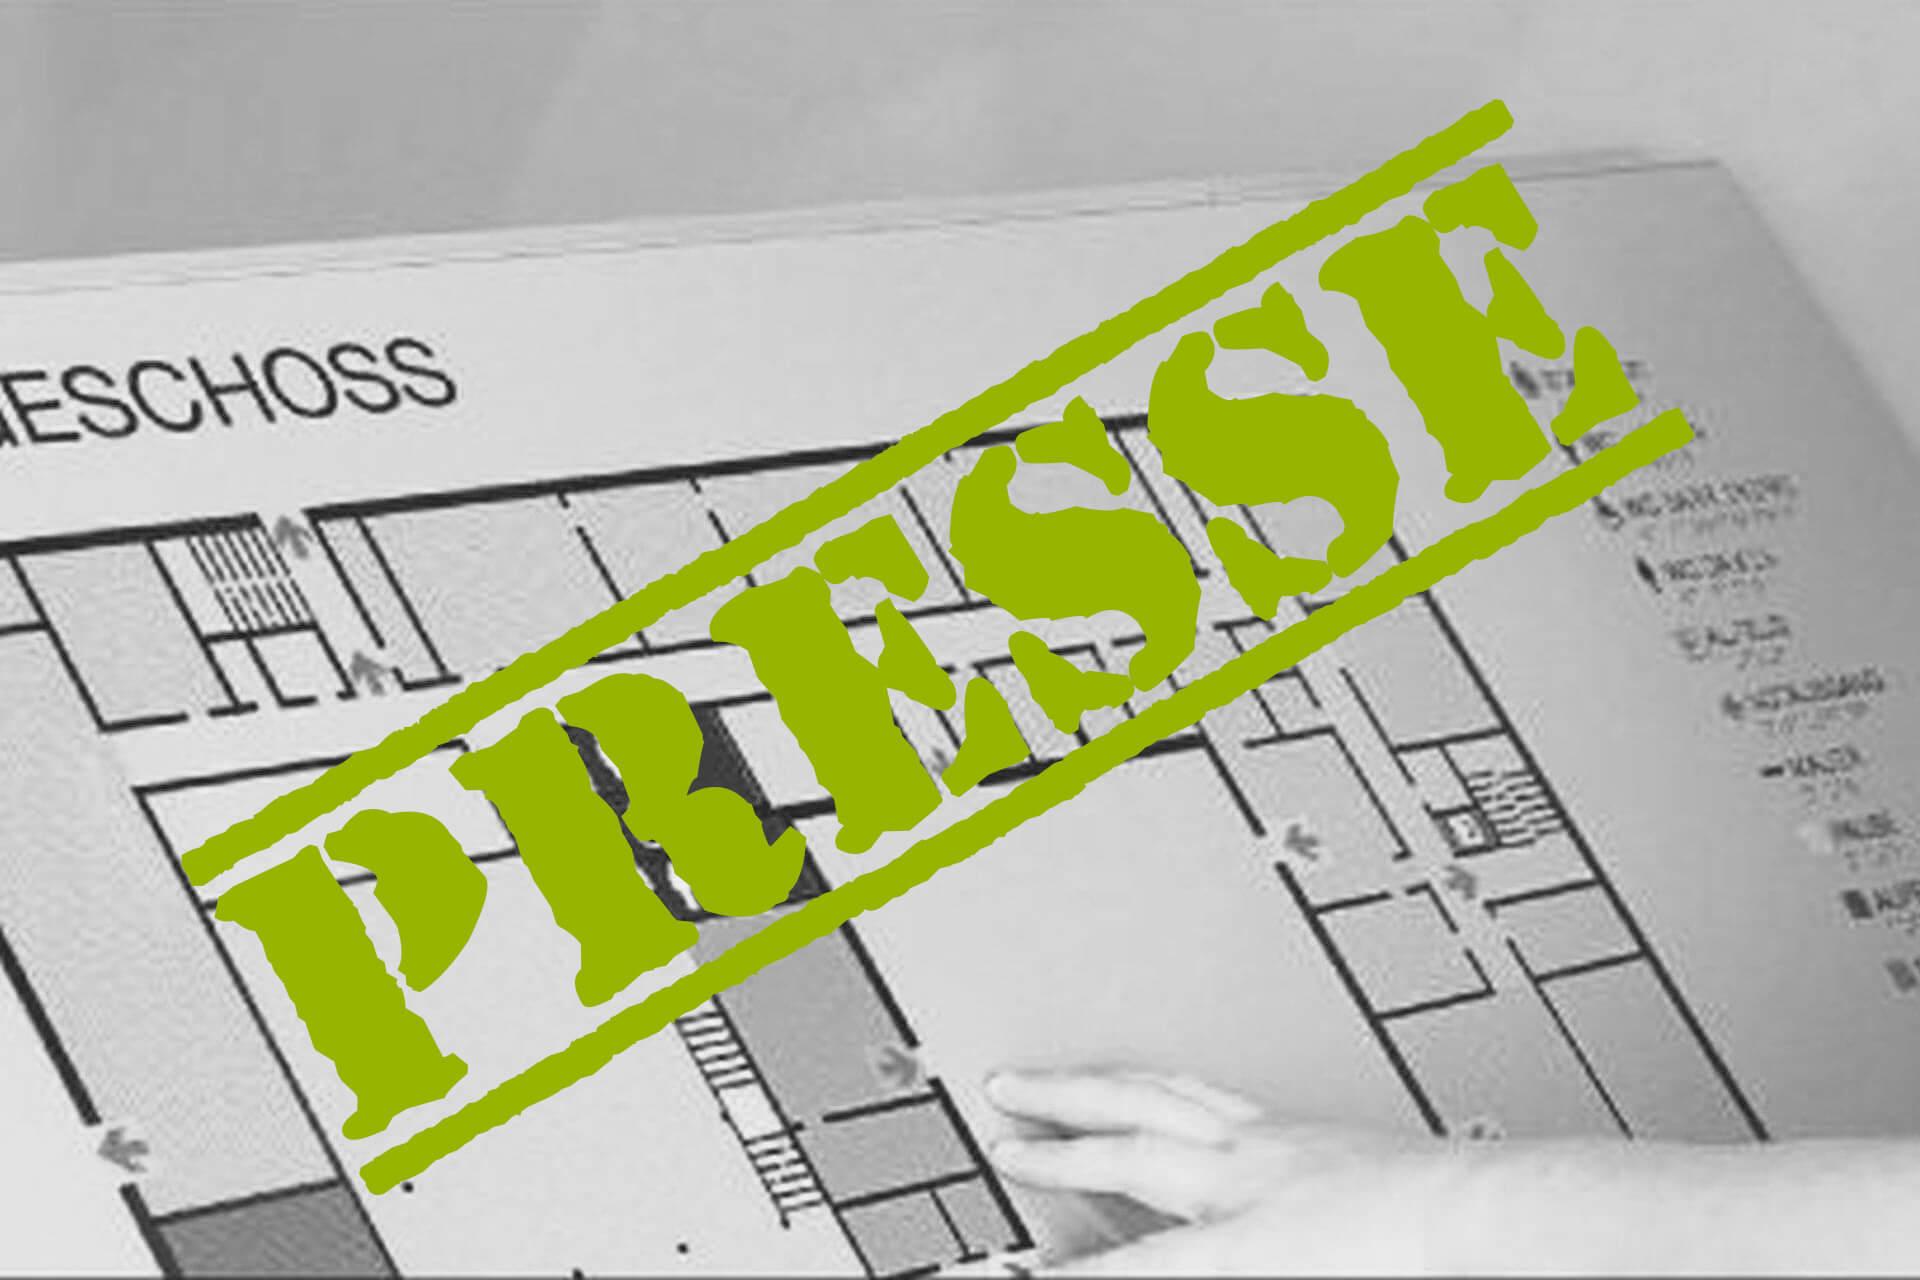 2016 09 27 Presse Barrierefrei Content Clip 2